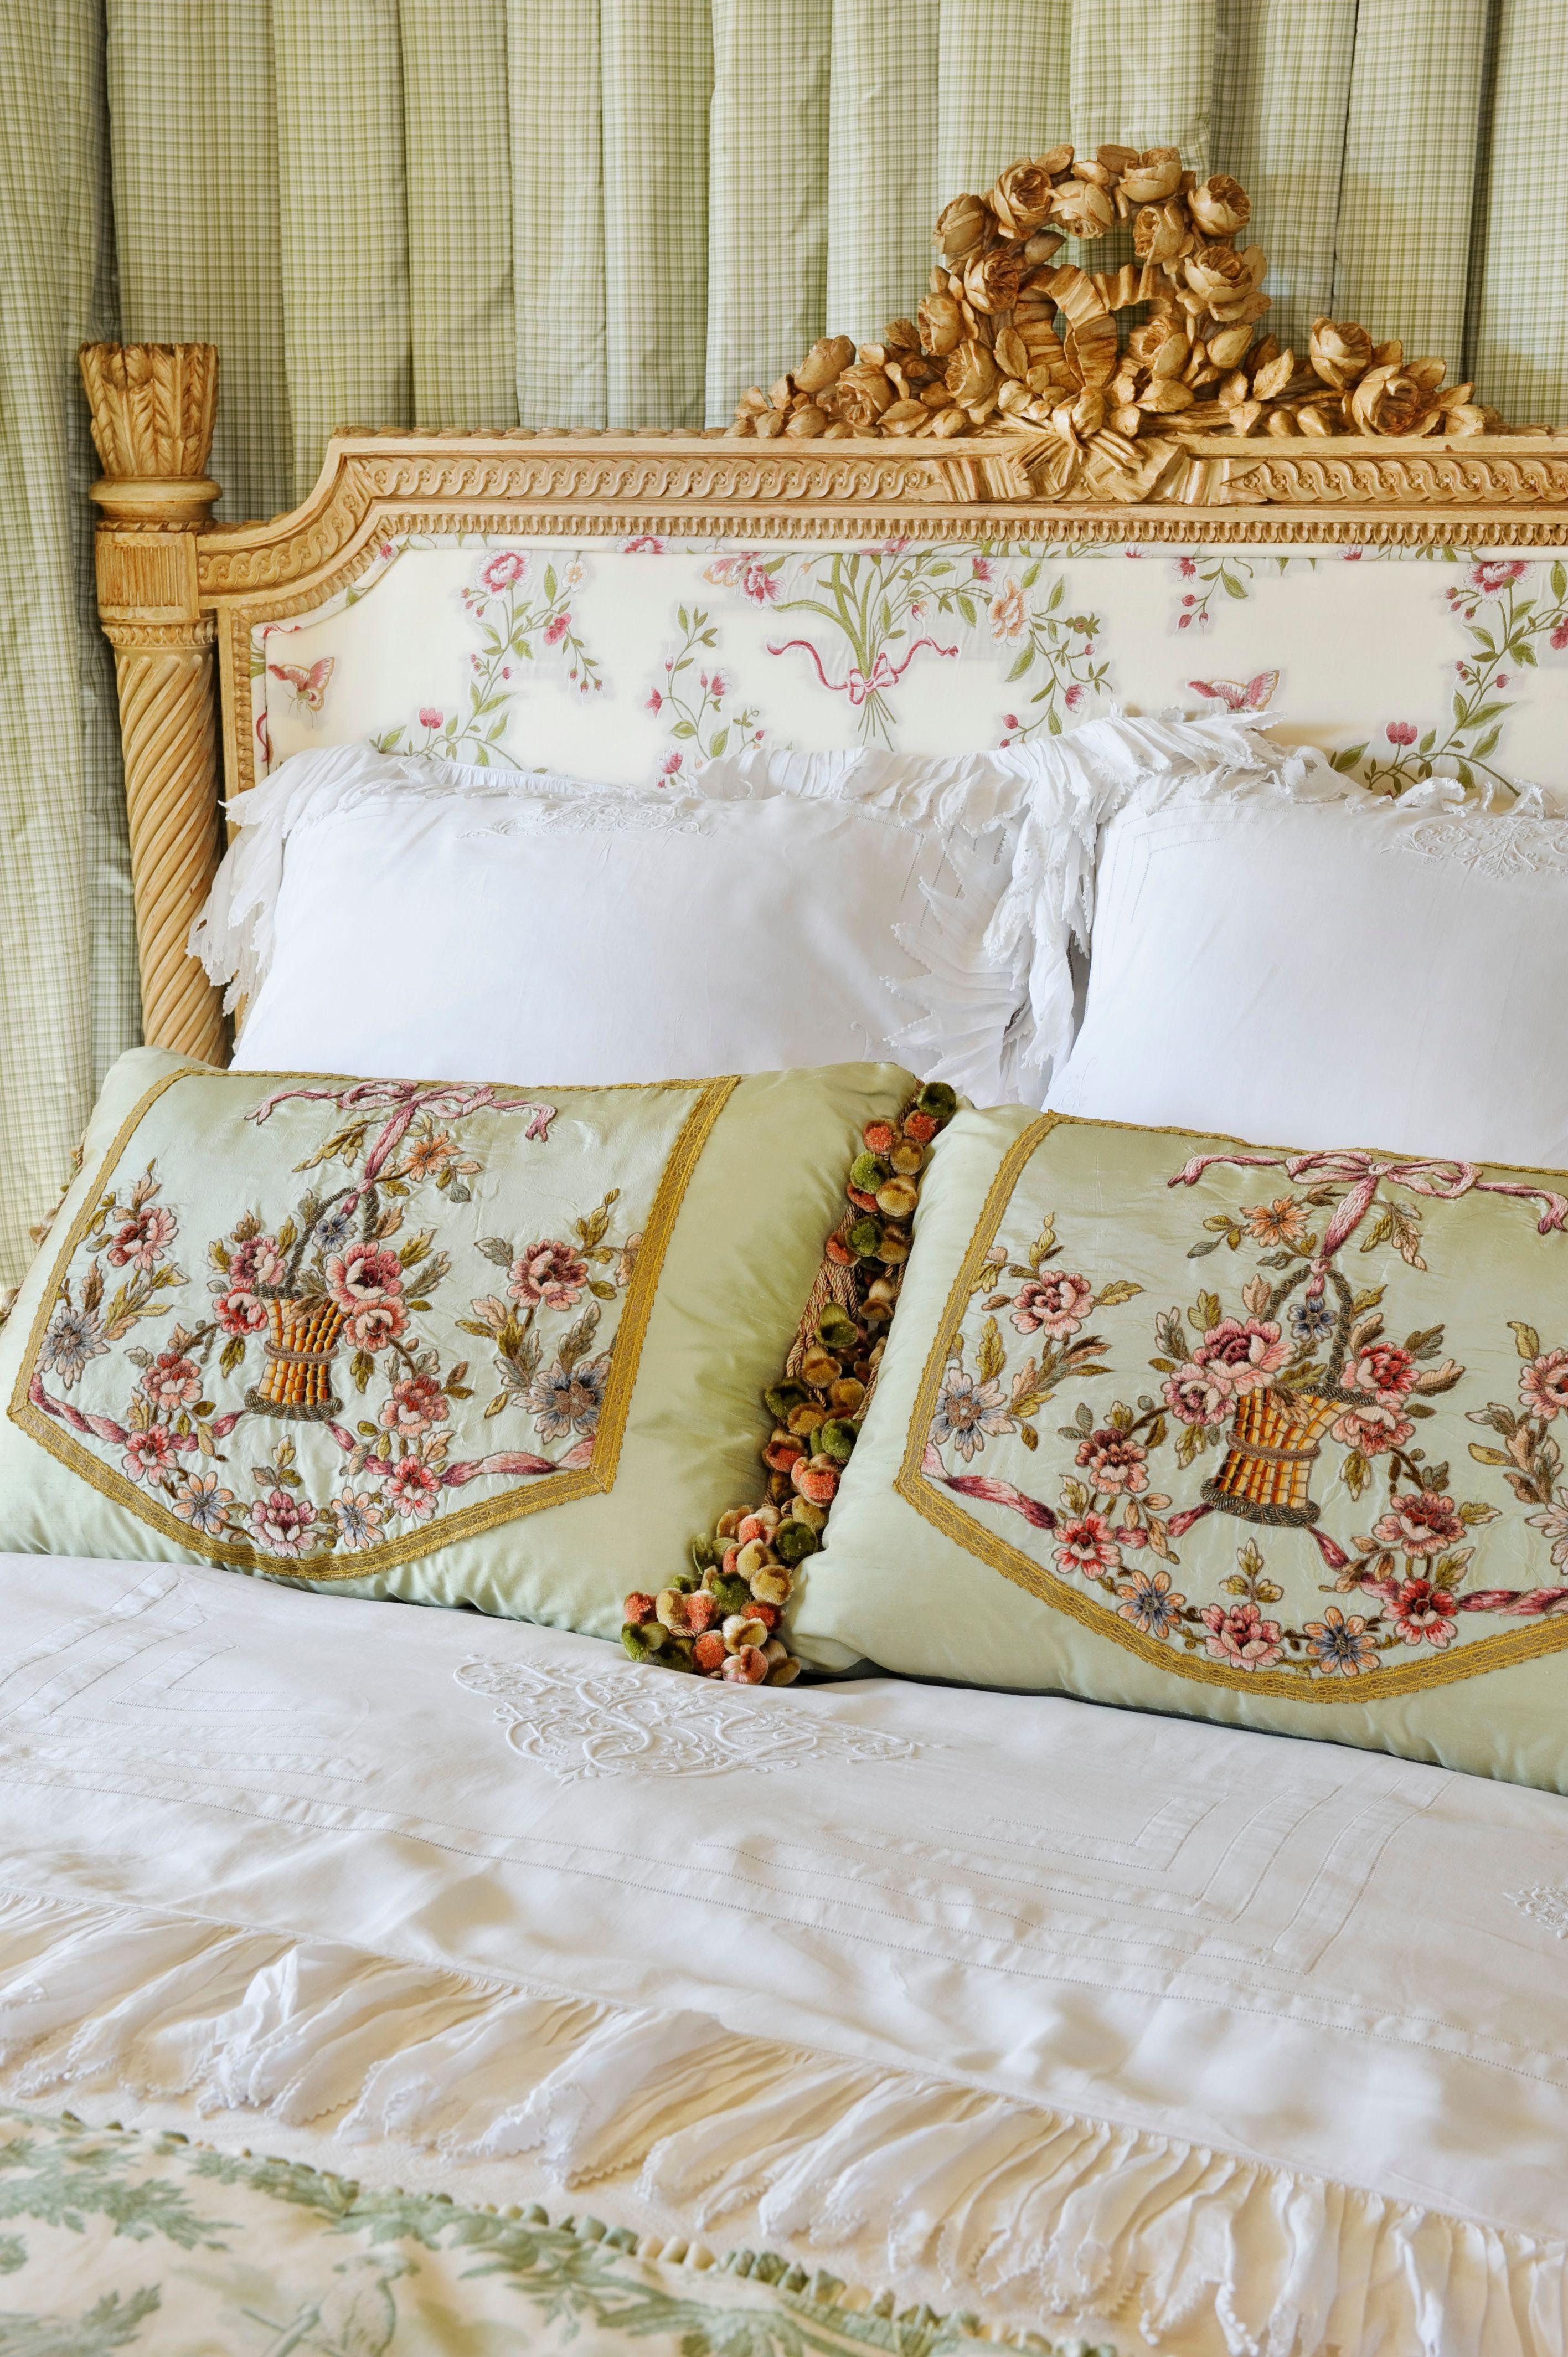 Antique Linens with Antique Pillows www.lindafloyd.com